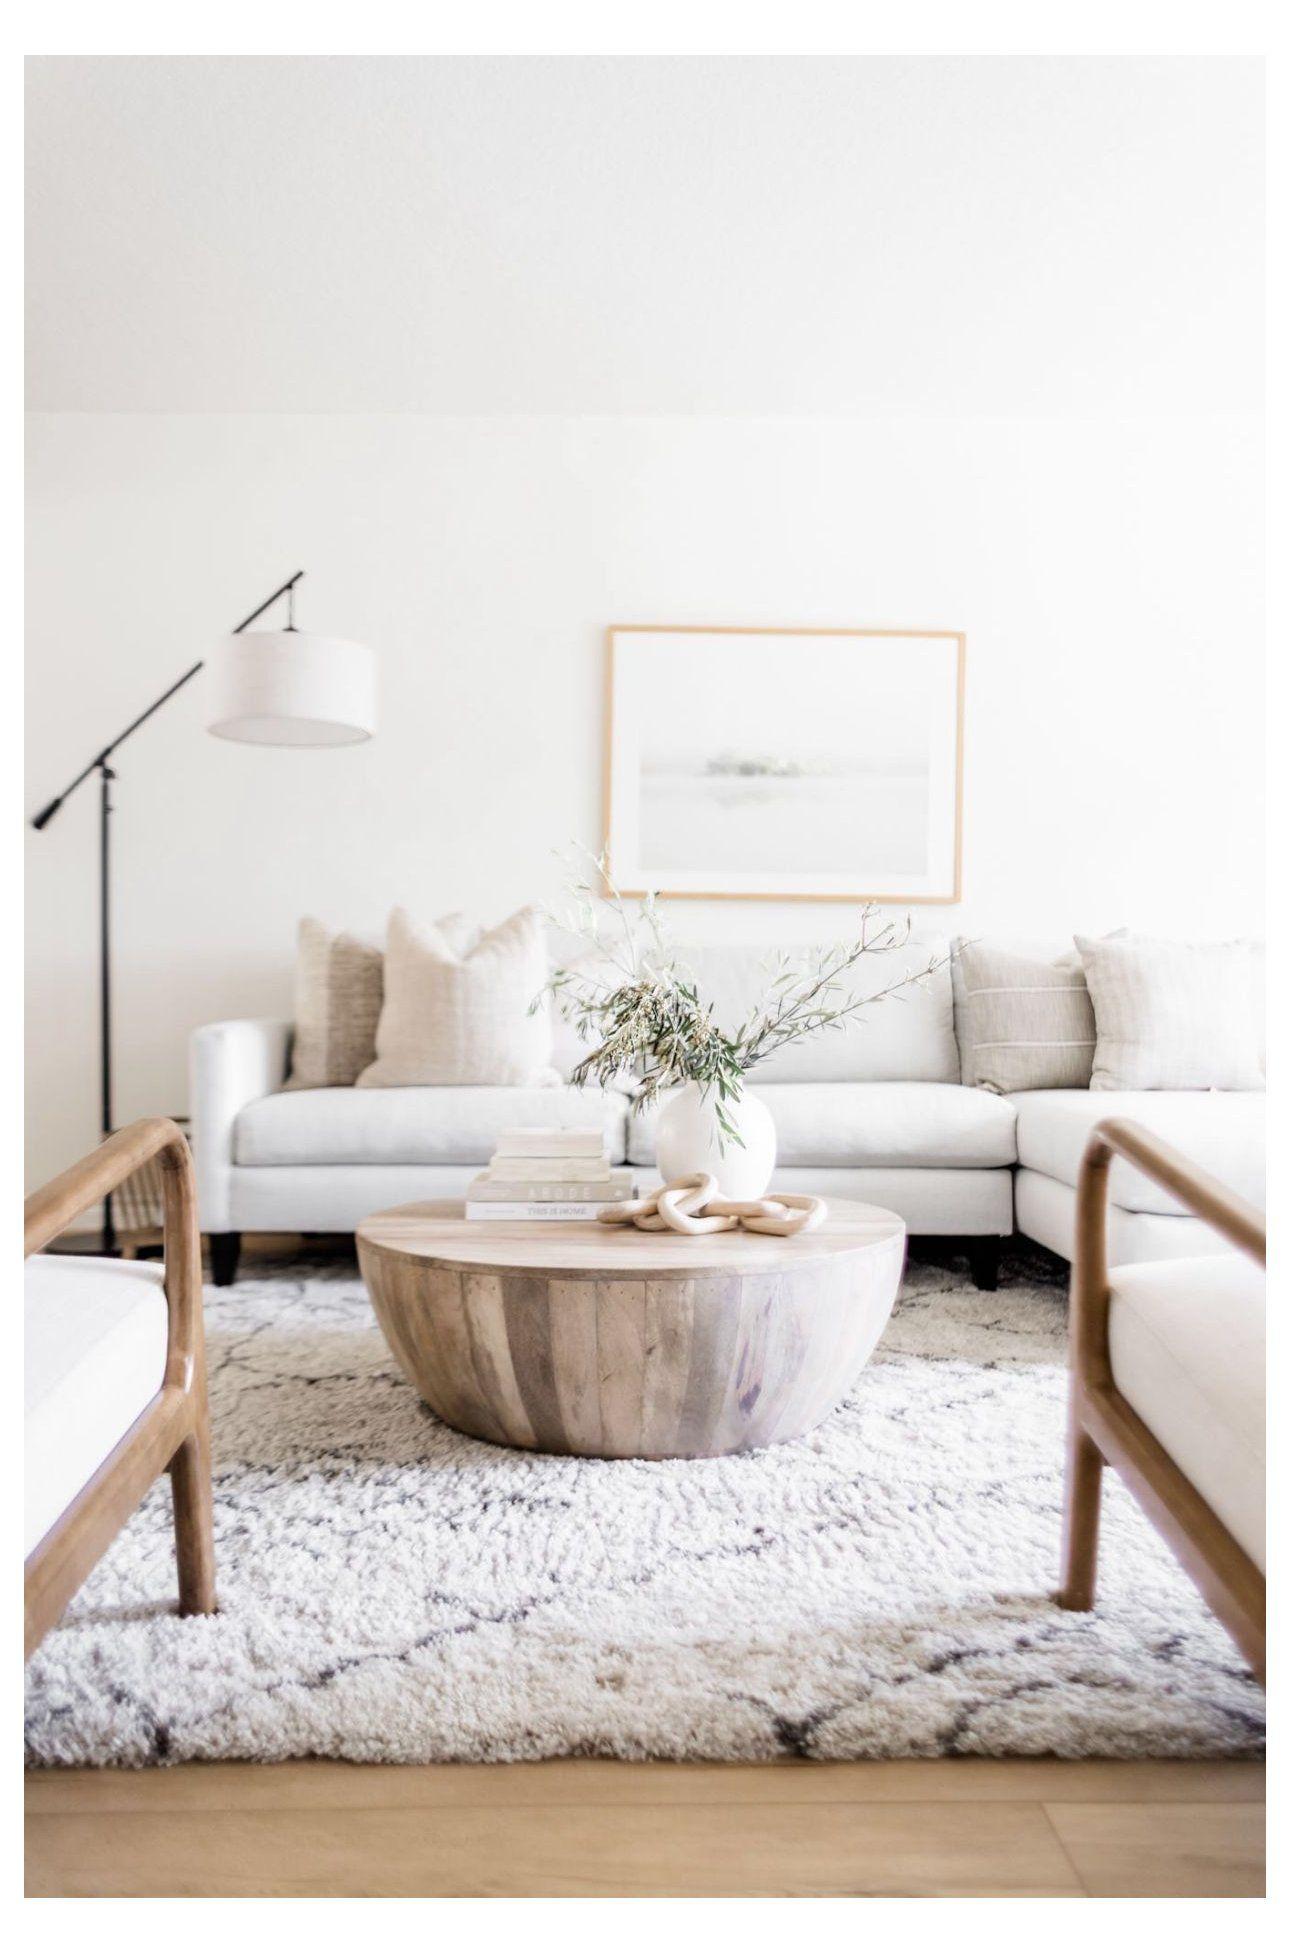 Last Week S Follower Favorites Living Room Area Rug Ideas Farmhouse Happy Sunday In 2020 Rugs In Living Room Minimalist Living Room Home Decor #small #living #room #area #rugs